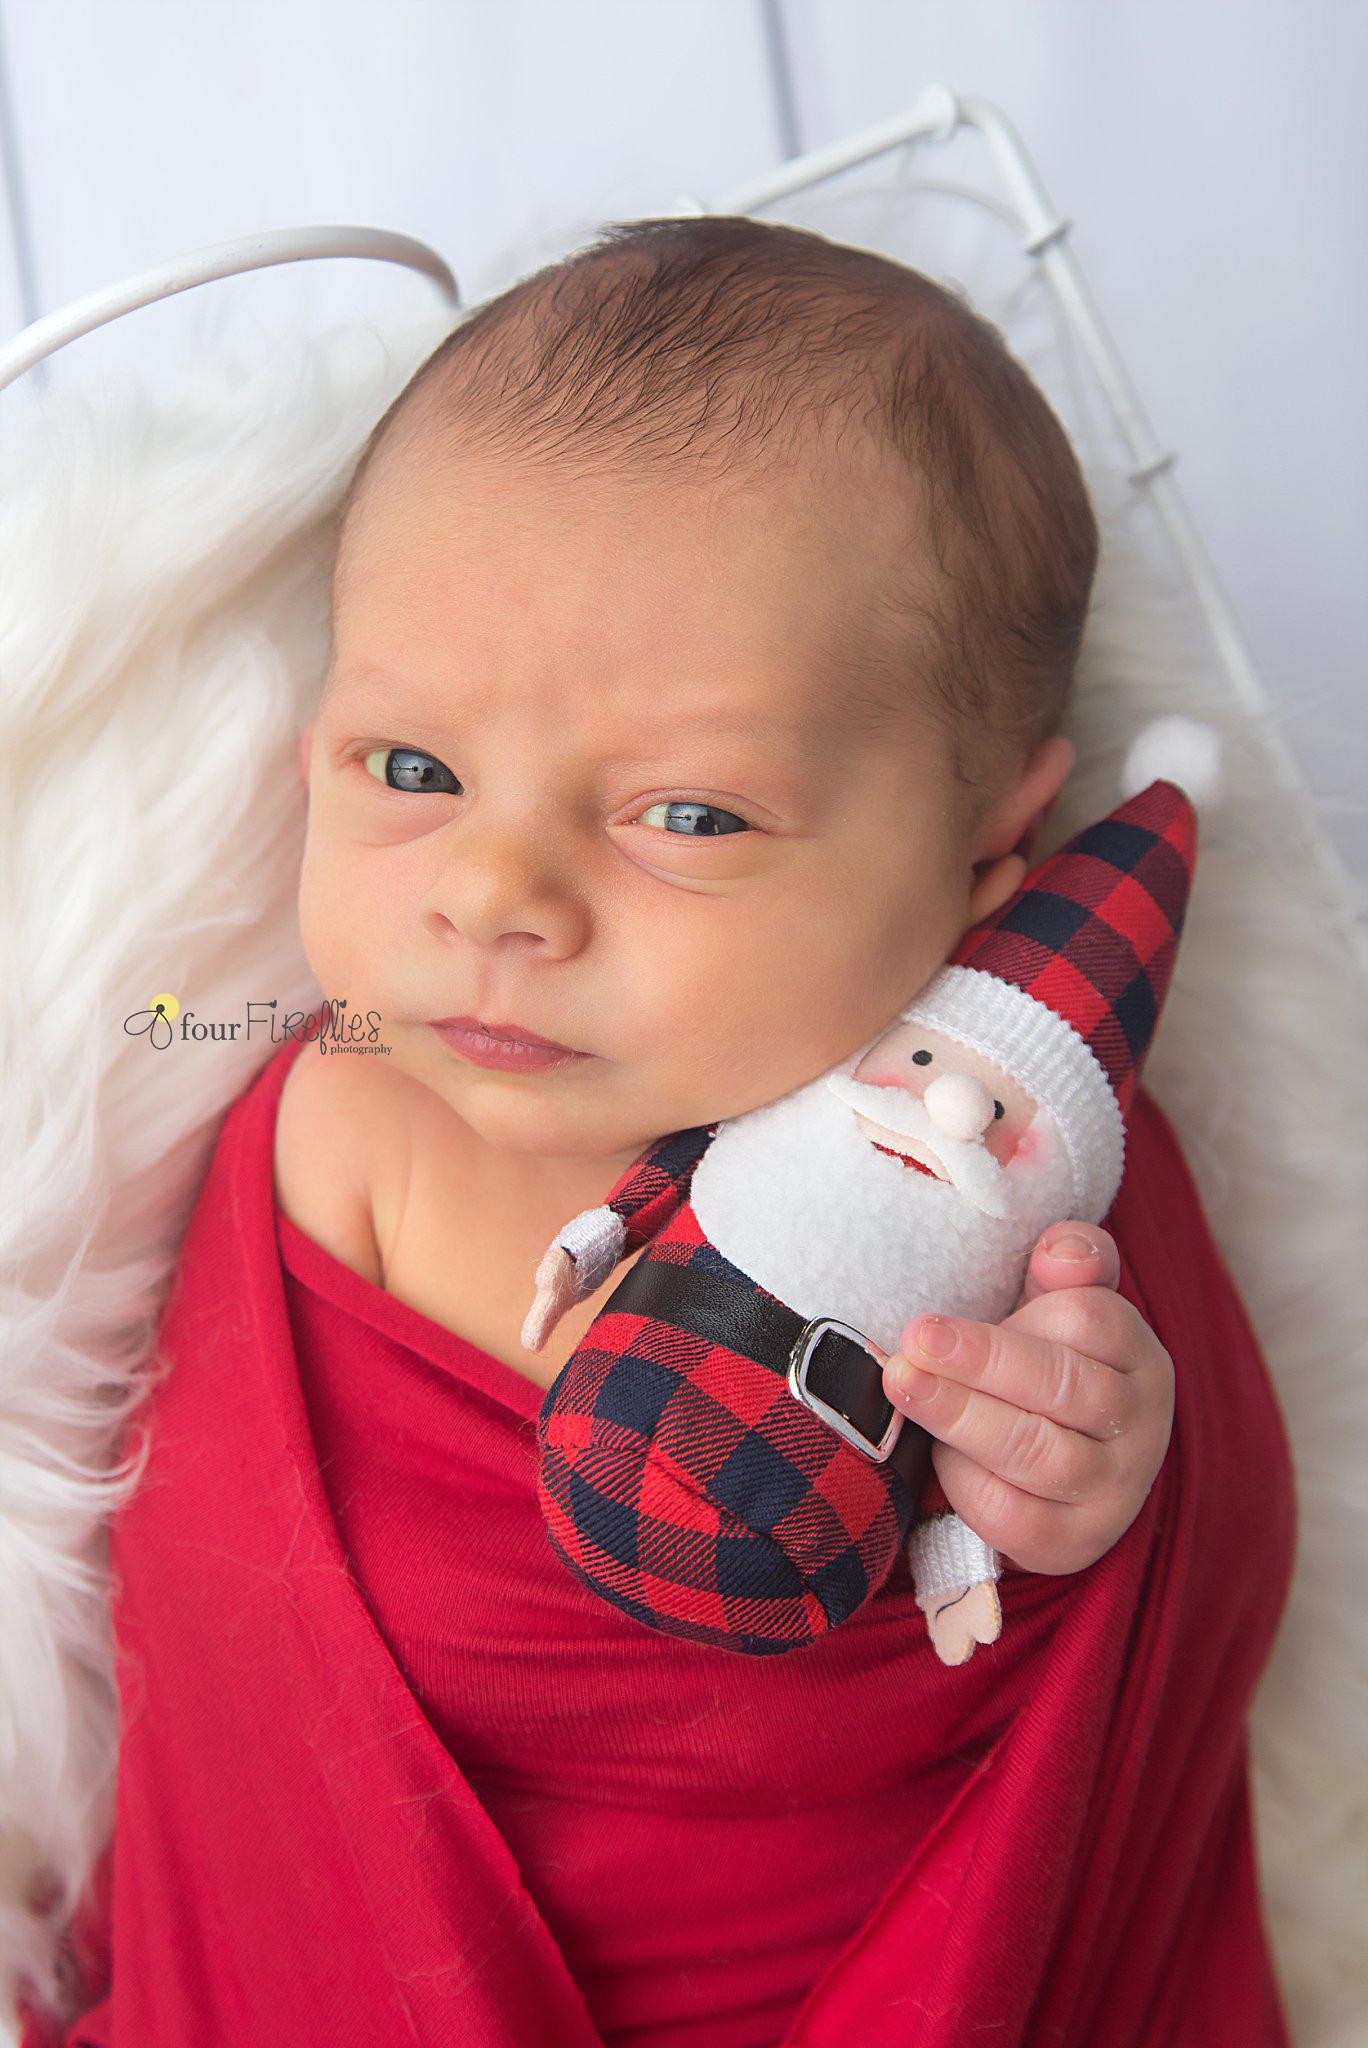 st-louis-newborn-photographer-christmas-baby-awake-holding-buffalo-plaid-stuffed-santa.jpg